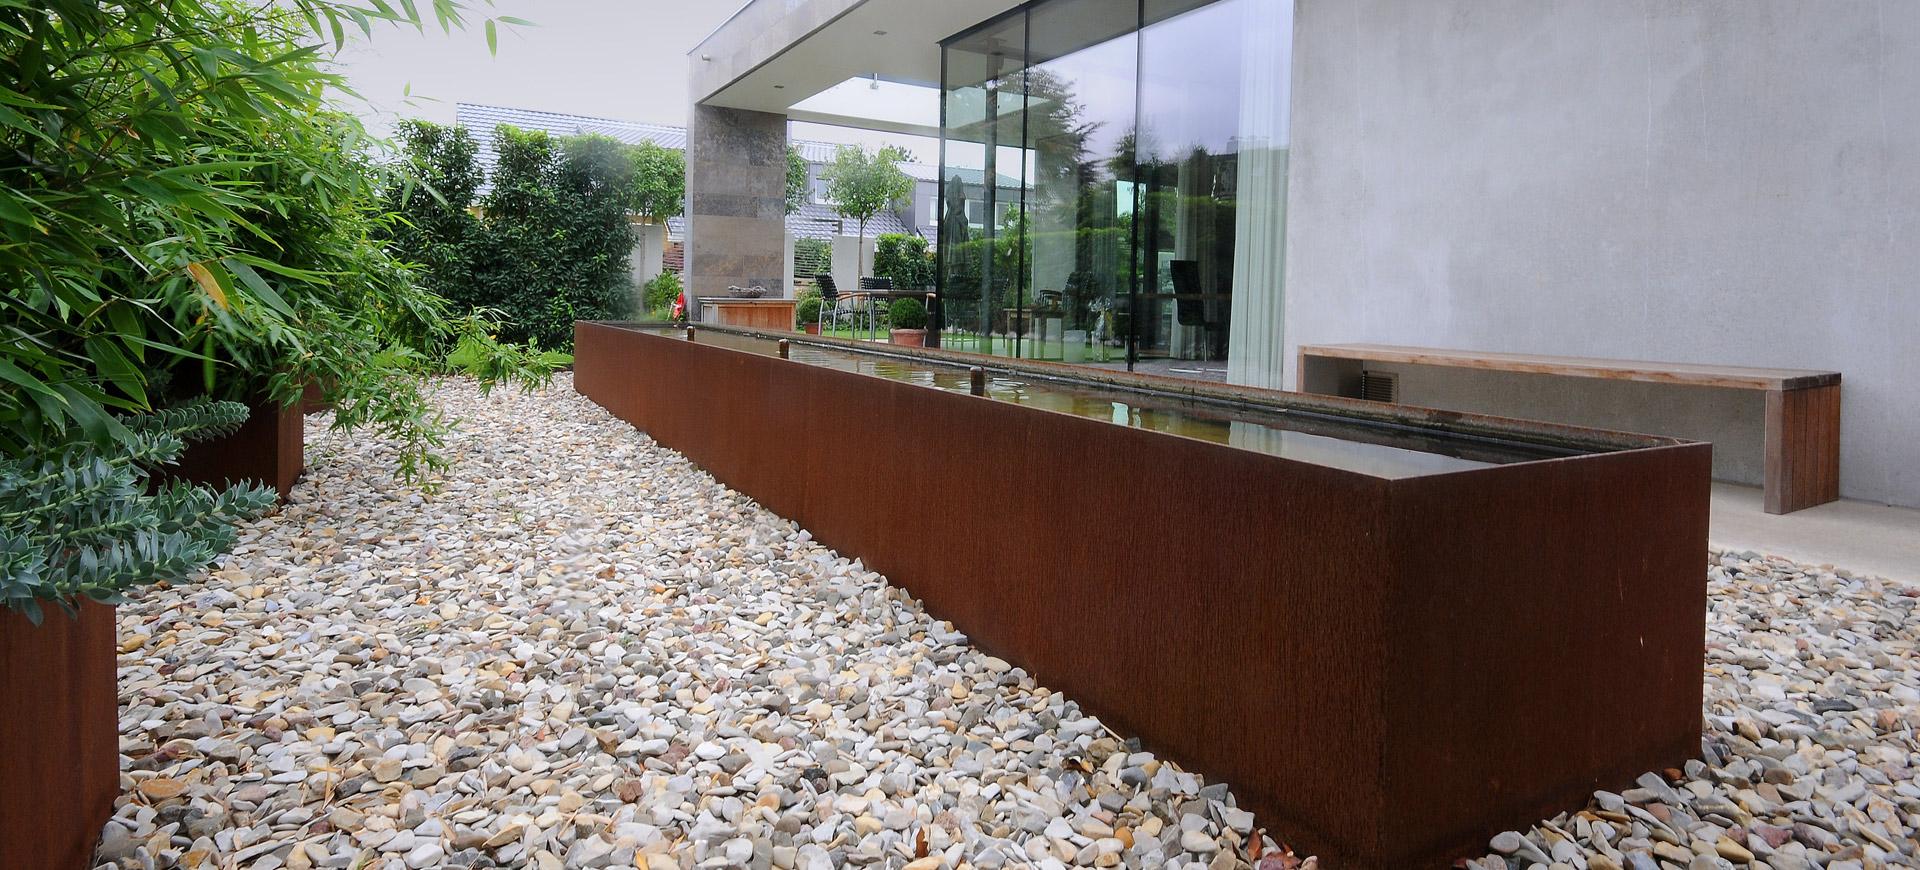 Wasser Arrangements Garten Driller Freiraumgestaltung